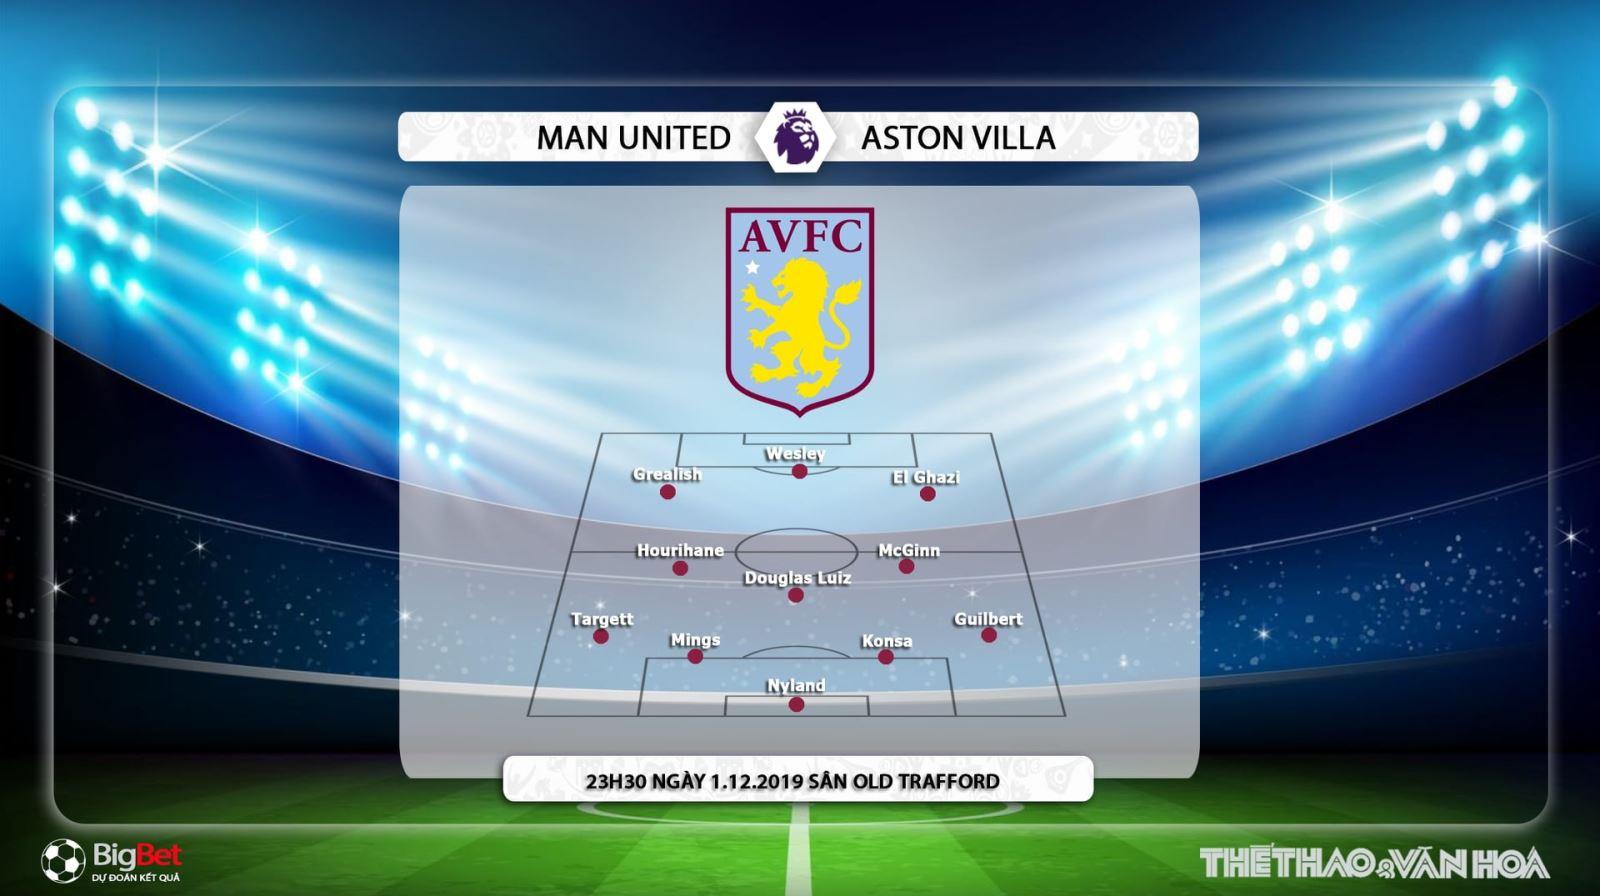 MU vs Aston Villa, trực tiếp MU vs Aston Villa, MU, Aston Villa, xem bóng đá trực tuyến, soi kèo MU vs Aston Villa, K+, K+PM, K+PC